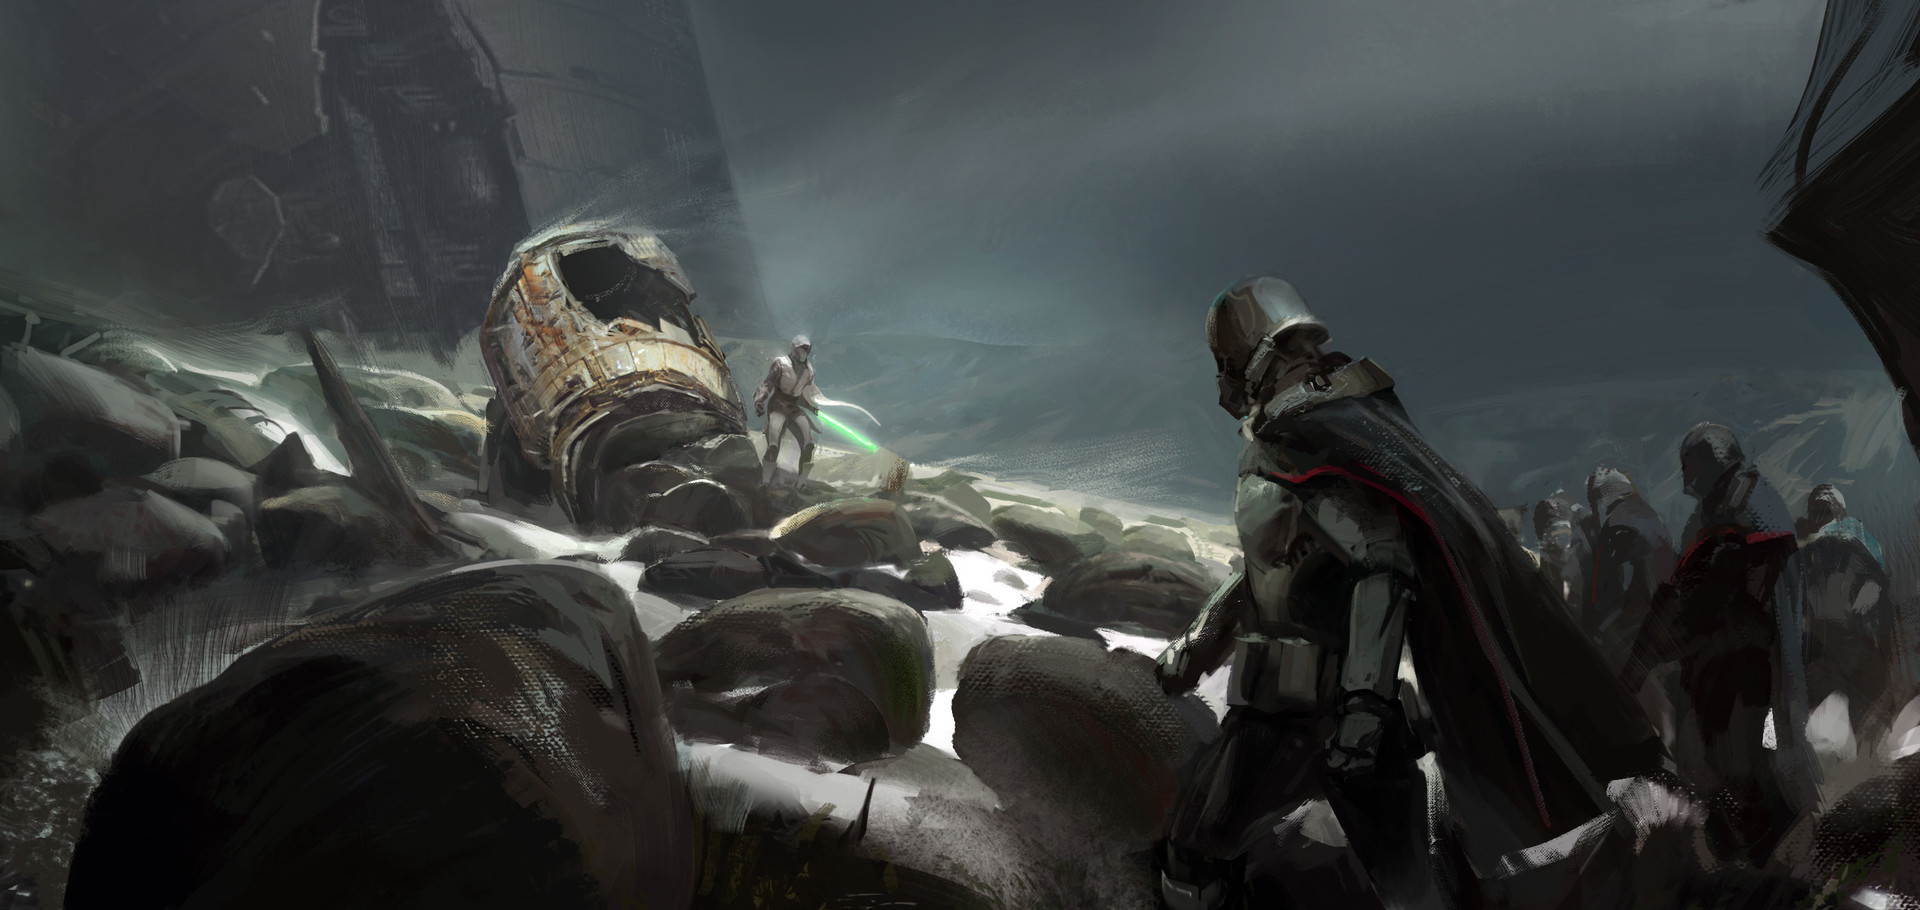 star wars clonetrooper concept - photo #17